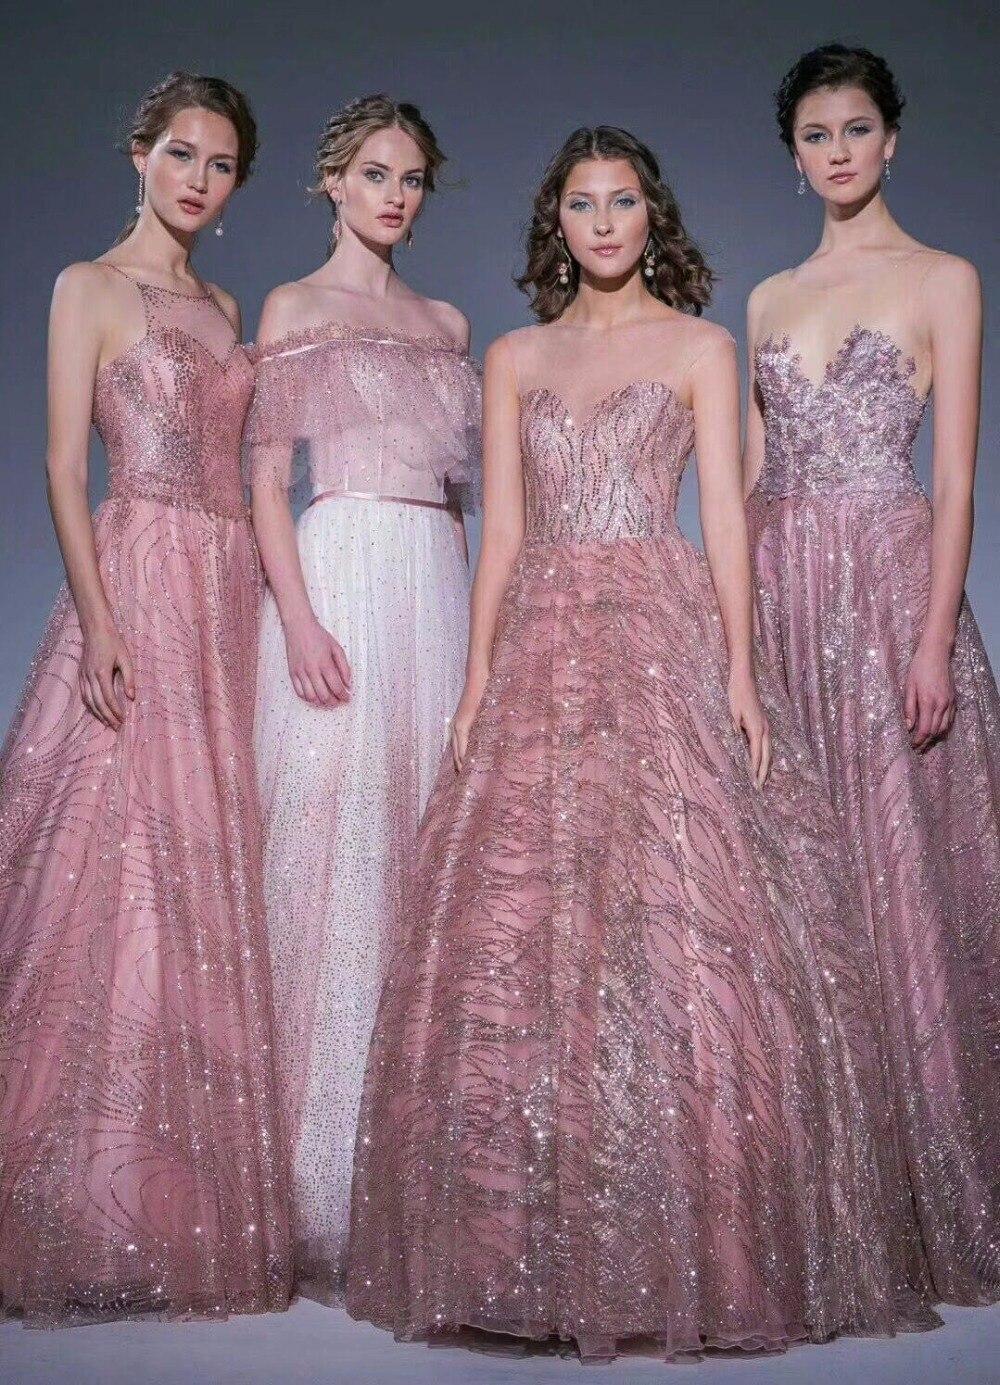 cor nu ouro rosa colado faísca glitter